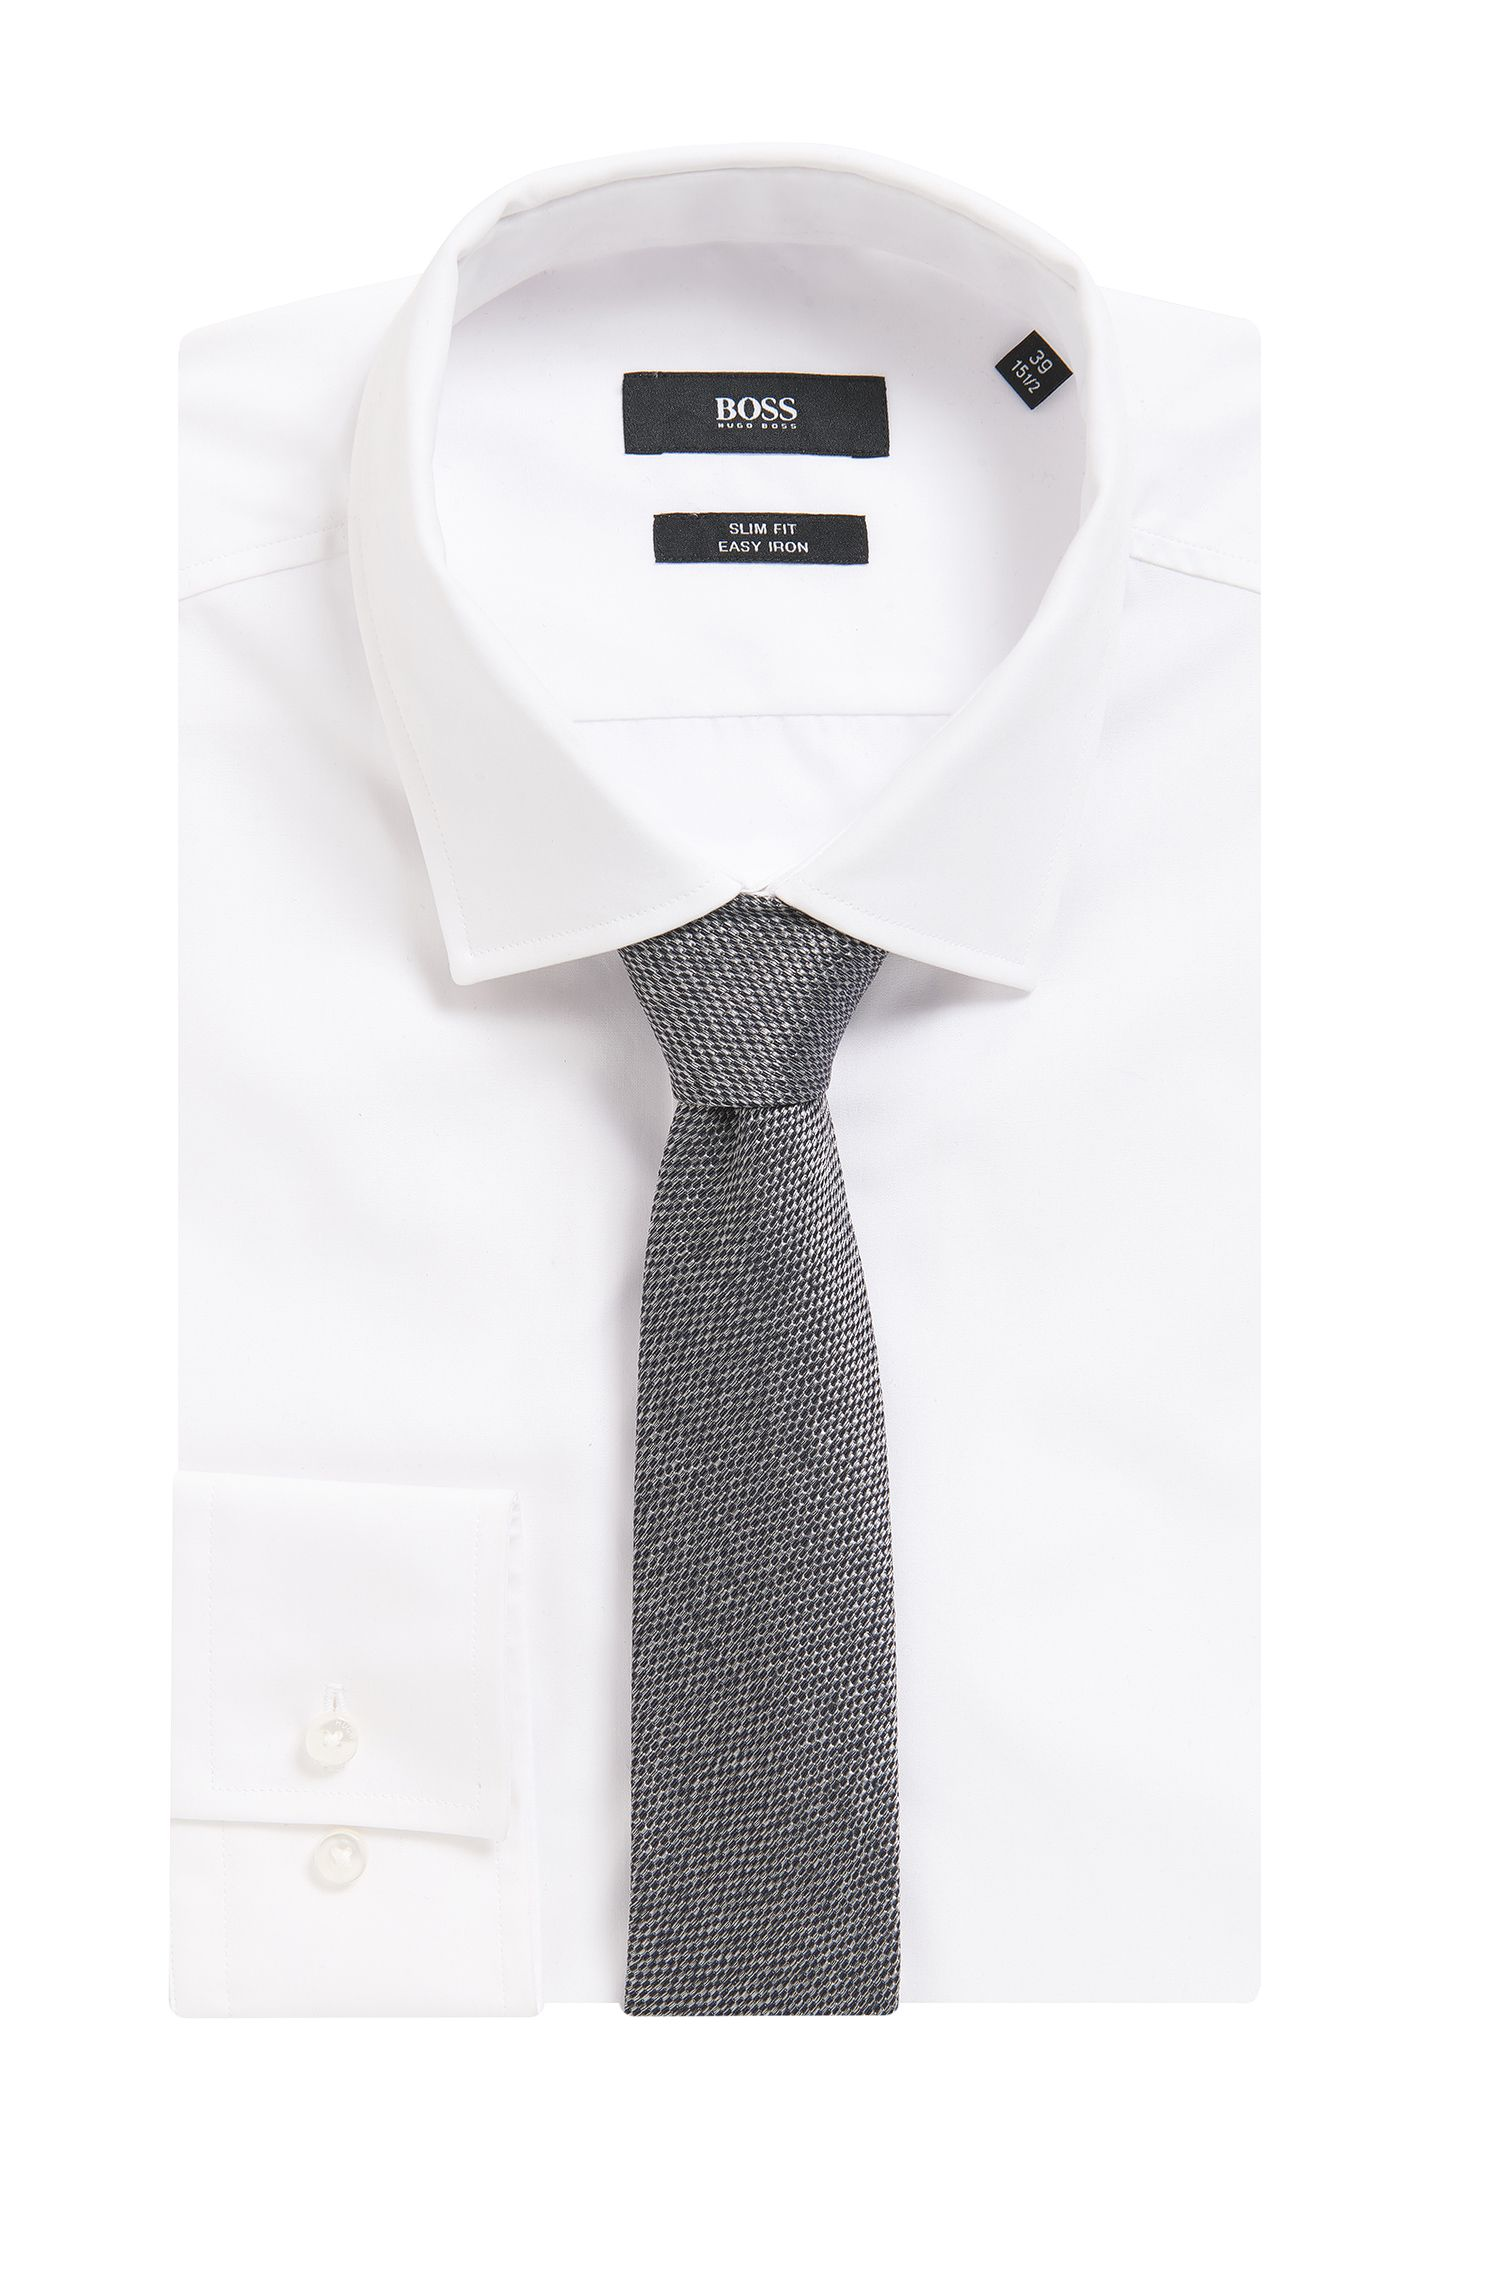 BOSS Tailored Sharkskin Italian Silk Slim Tie, Grey